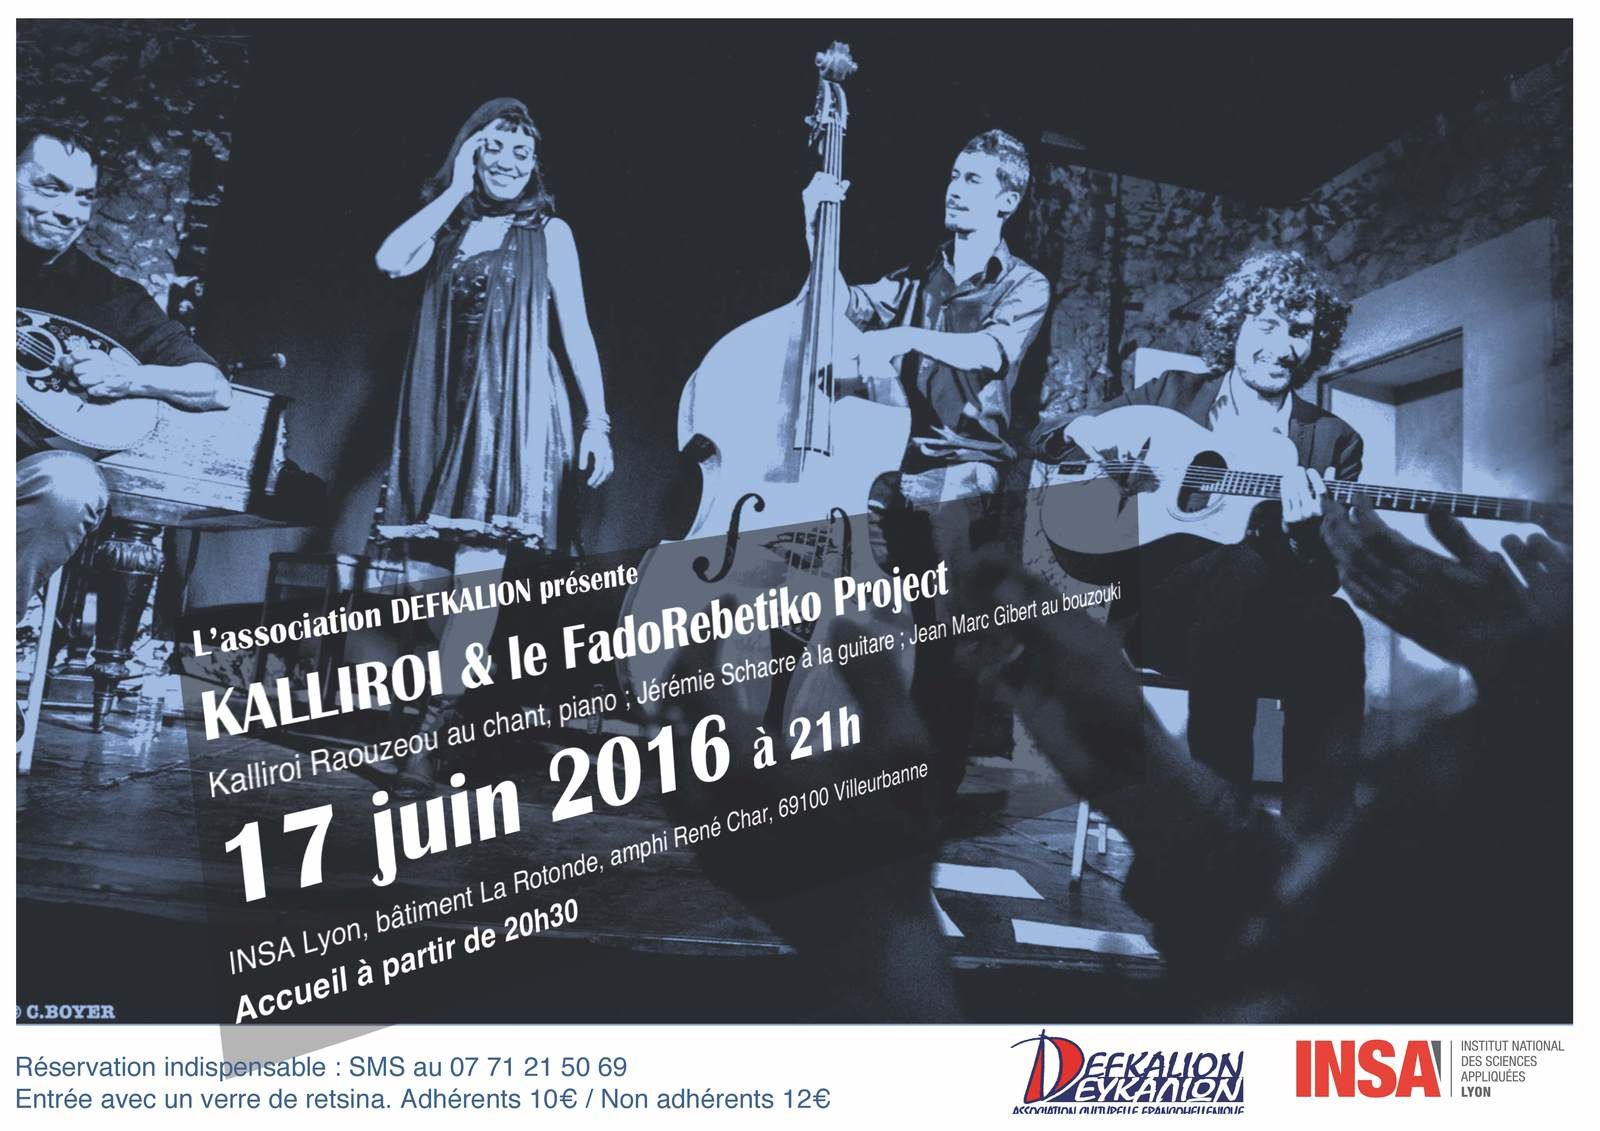 Concert de Kalliroi Raouzaiou vendredi 17 juin 2016